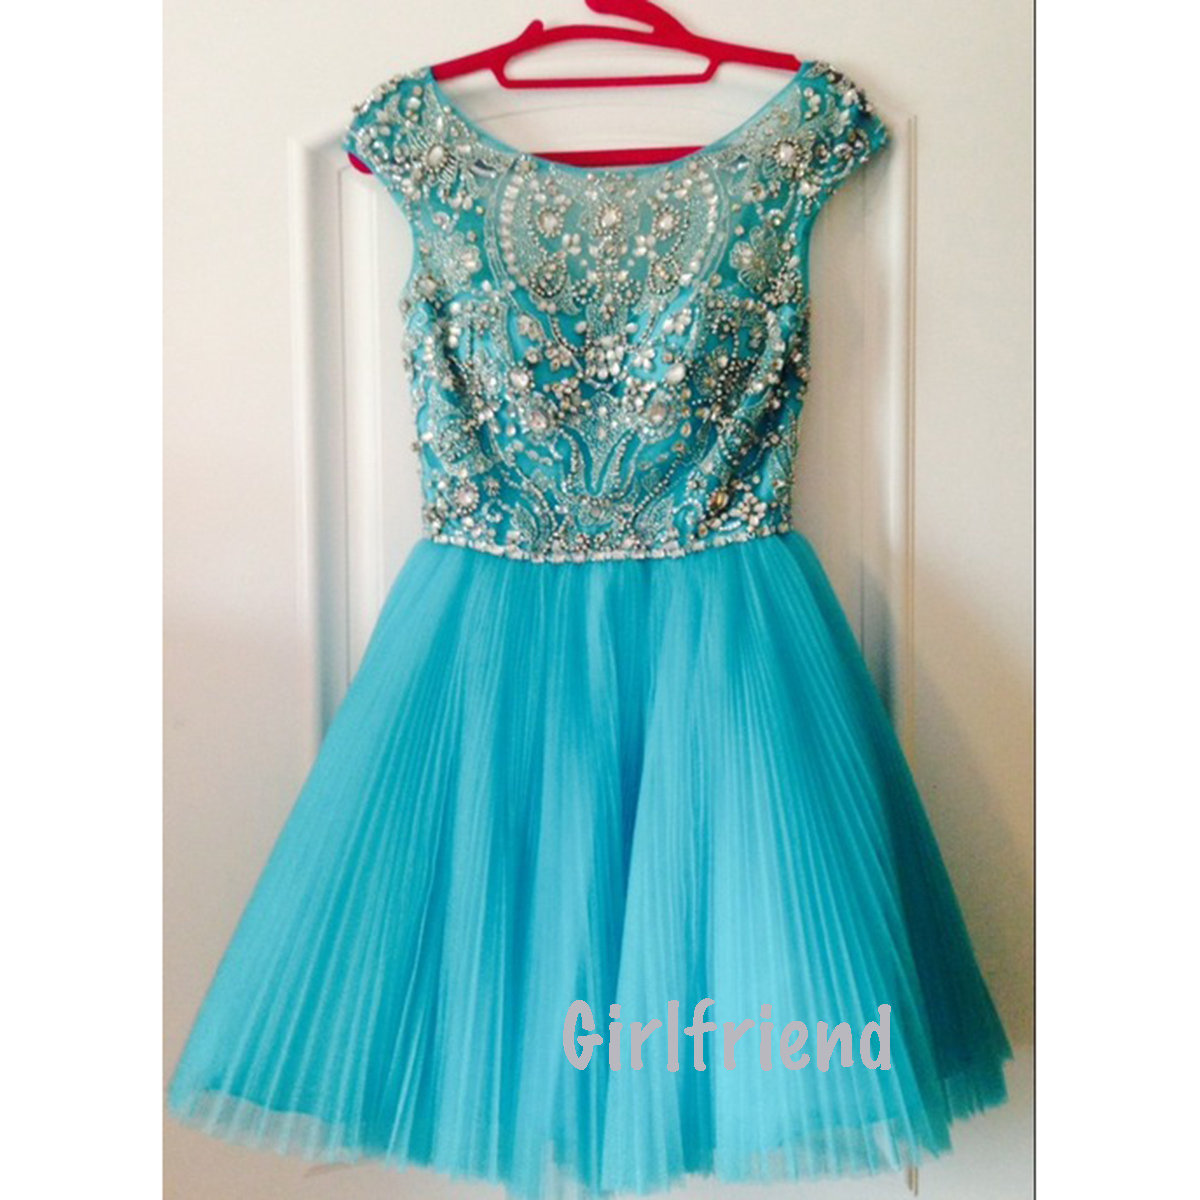 Short Cute Dresses Tumblr - Castrophotos